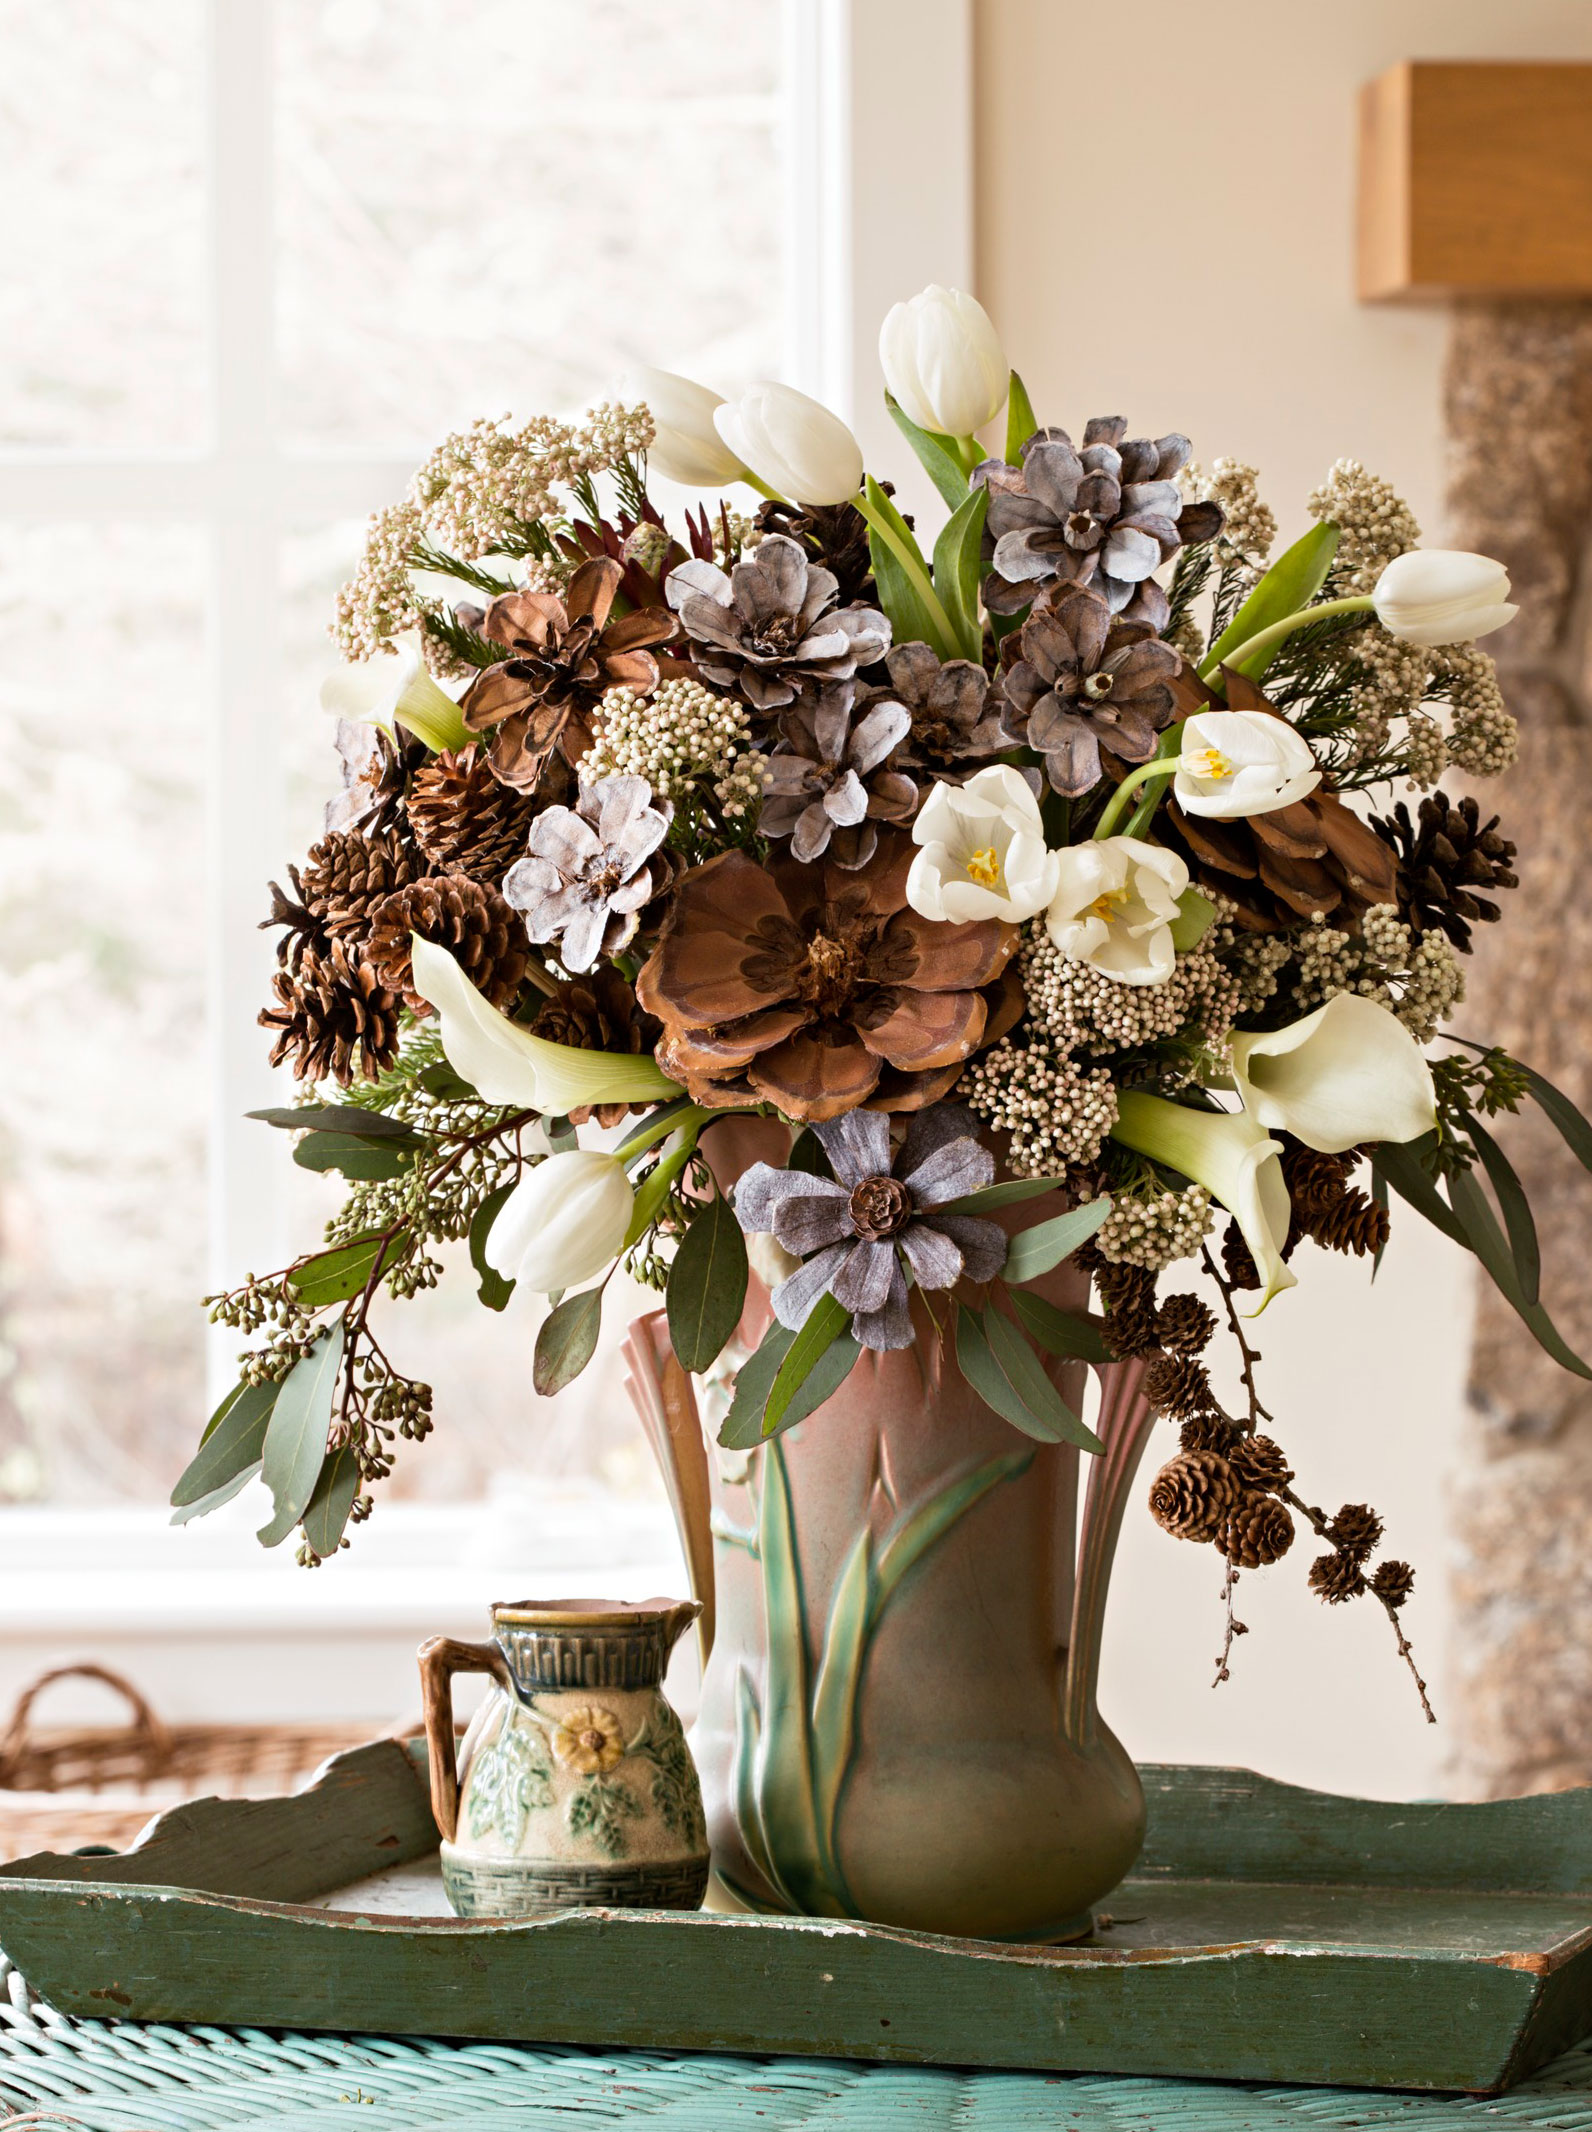 Pinecone arrangement